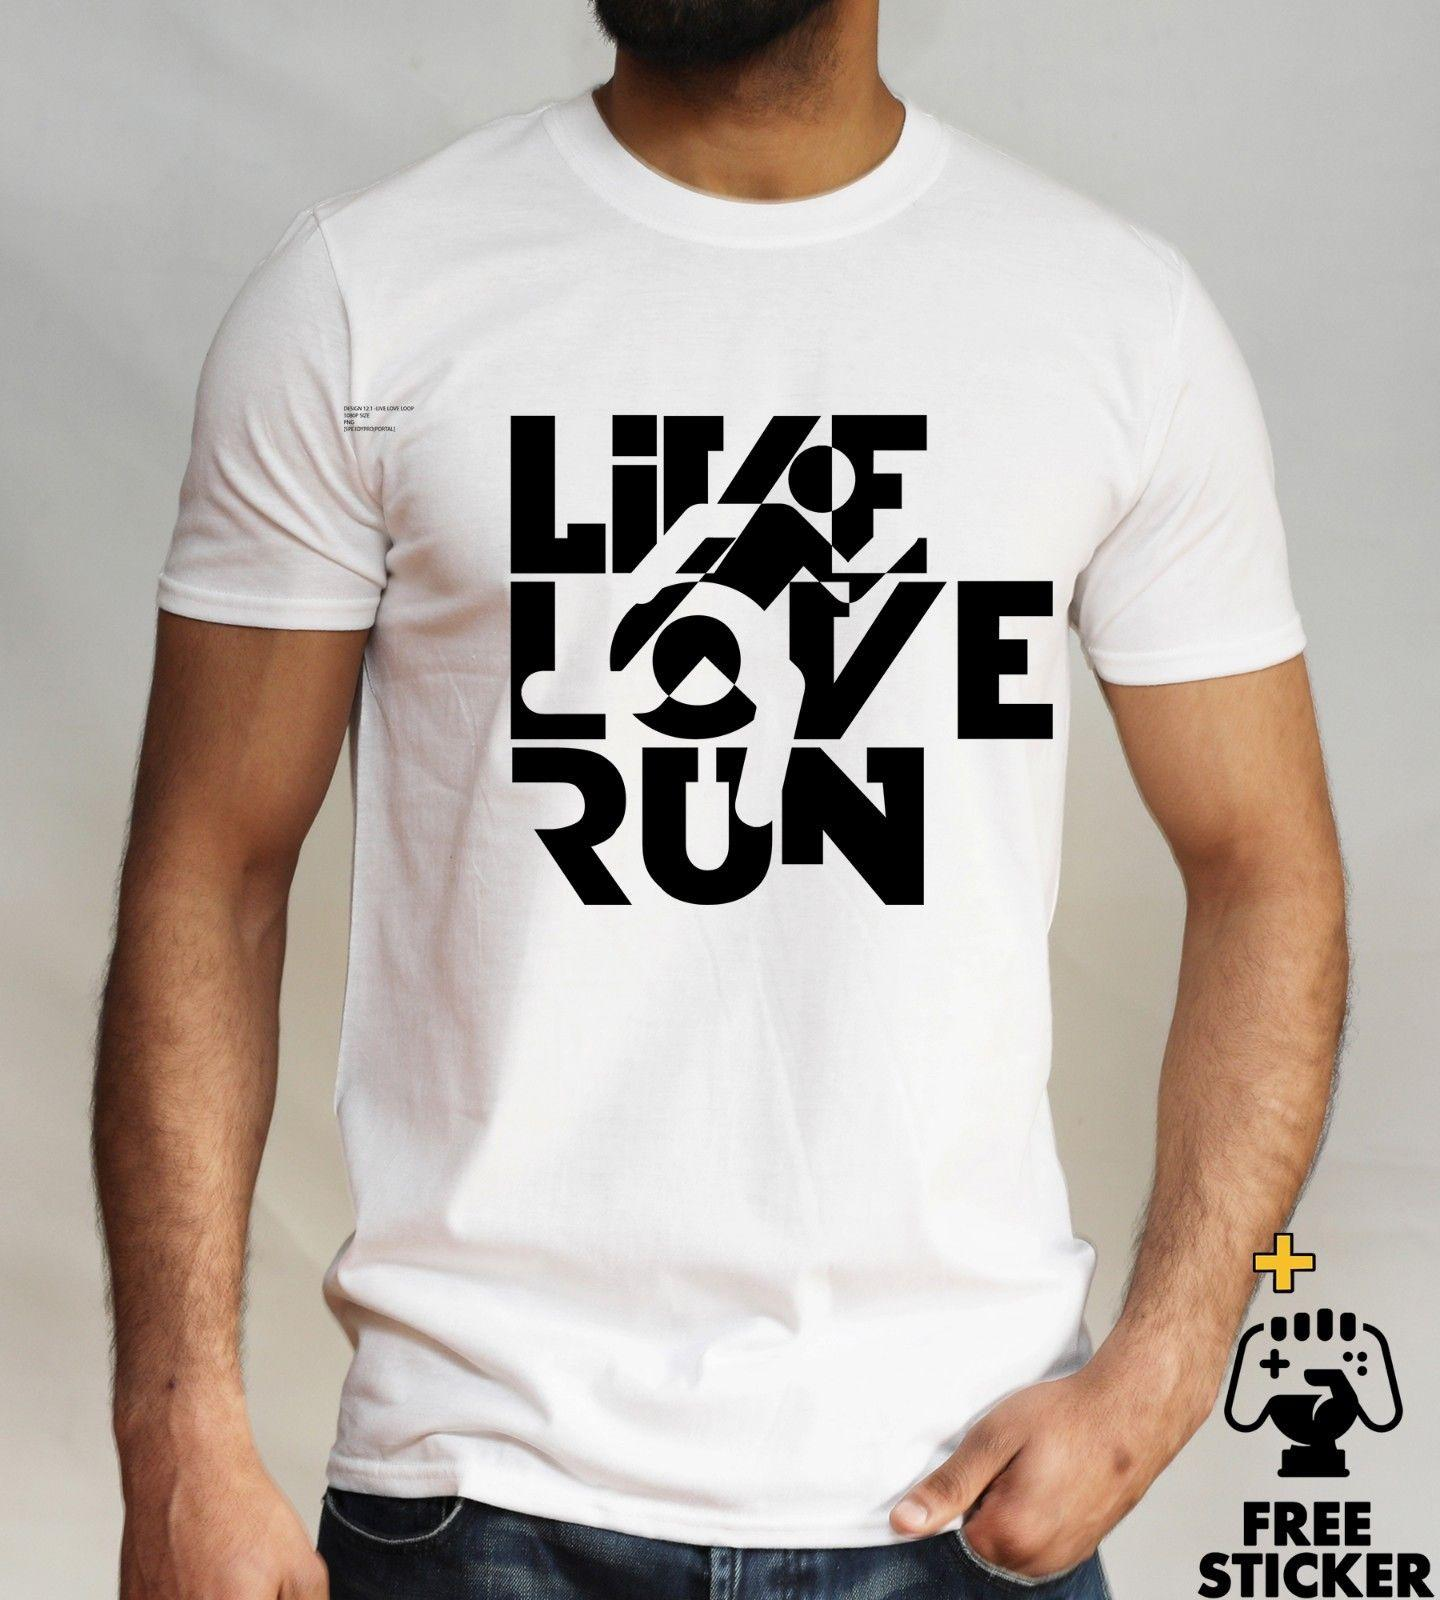 469668362 Live Love Run T Shirt, Sporty, Athlete, Marathon Running, Tumblr Men Women  2018 High Quality ,Brand Men T Shirt, Casual Short Sleeve, Great Tee Shirt  ...